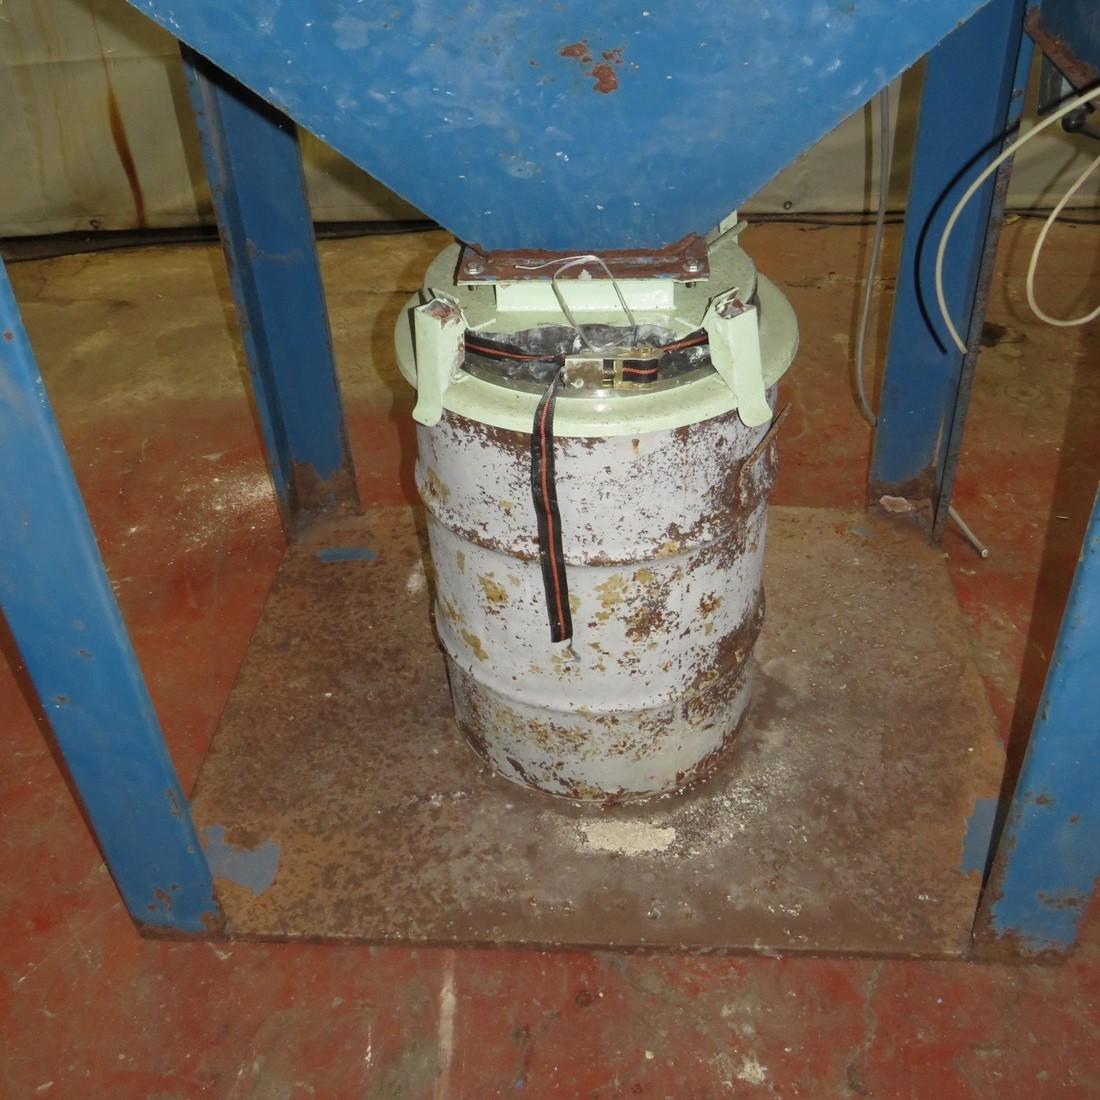 R1J1163 DELTA NEU Dust unit filter JETLINE C20 type